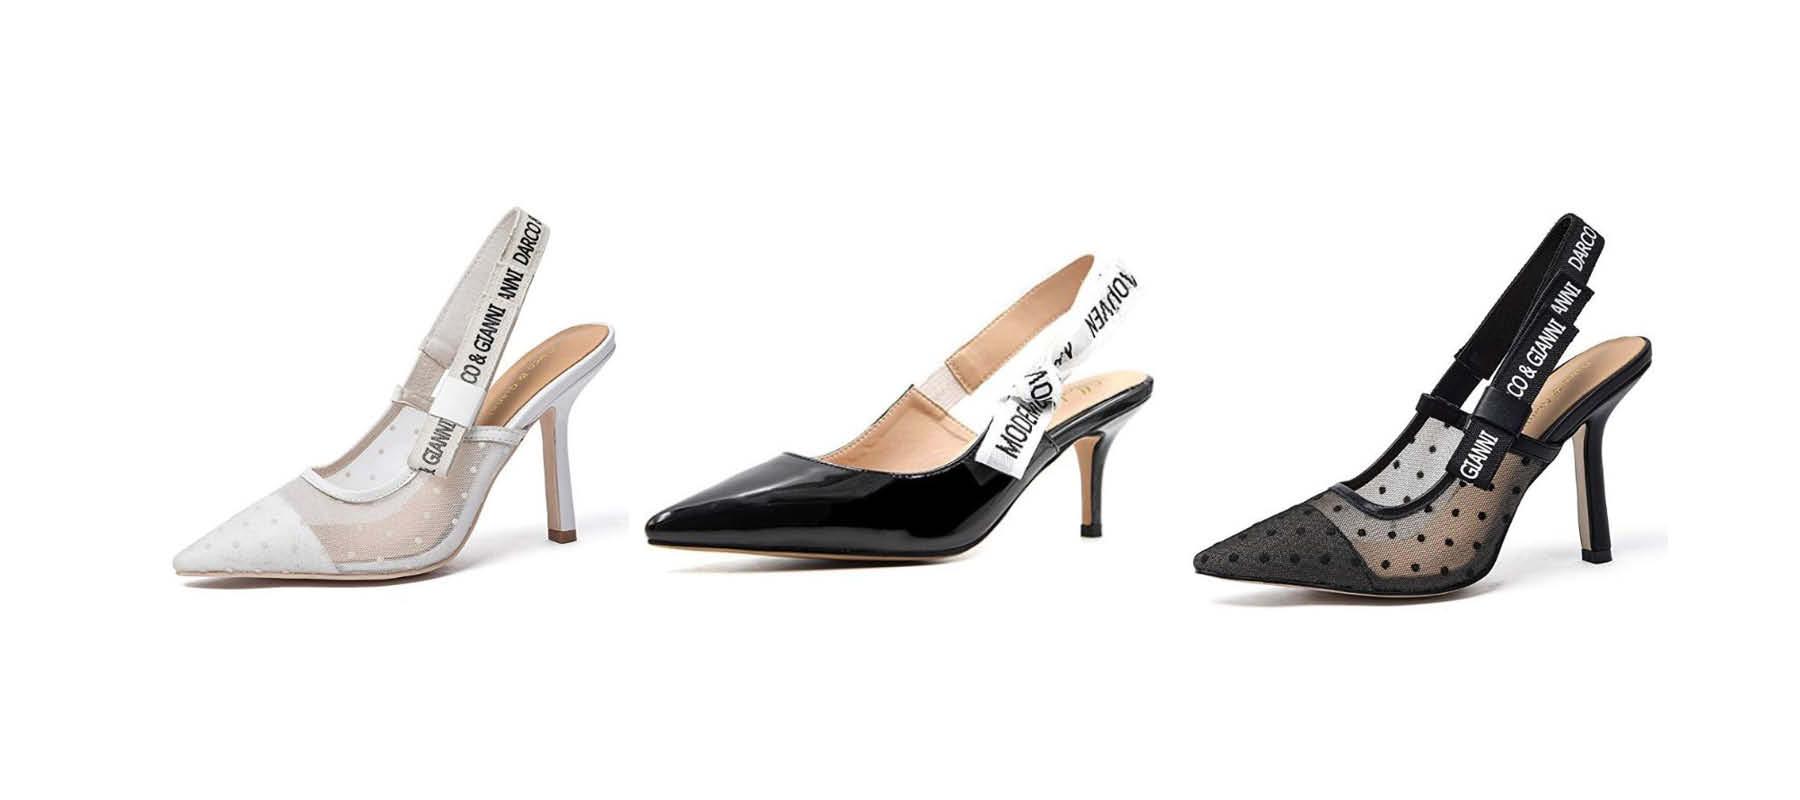 d792e4fad8f Ultimate Guide to Dior J'Adior Dupes | Dior Slingback Dupe for Less